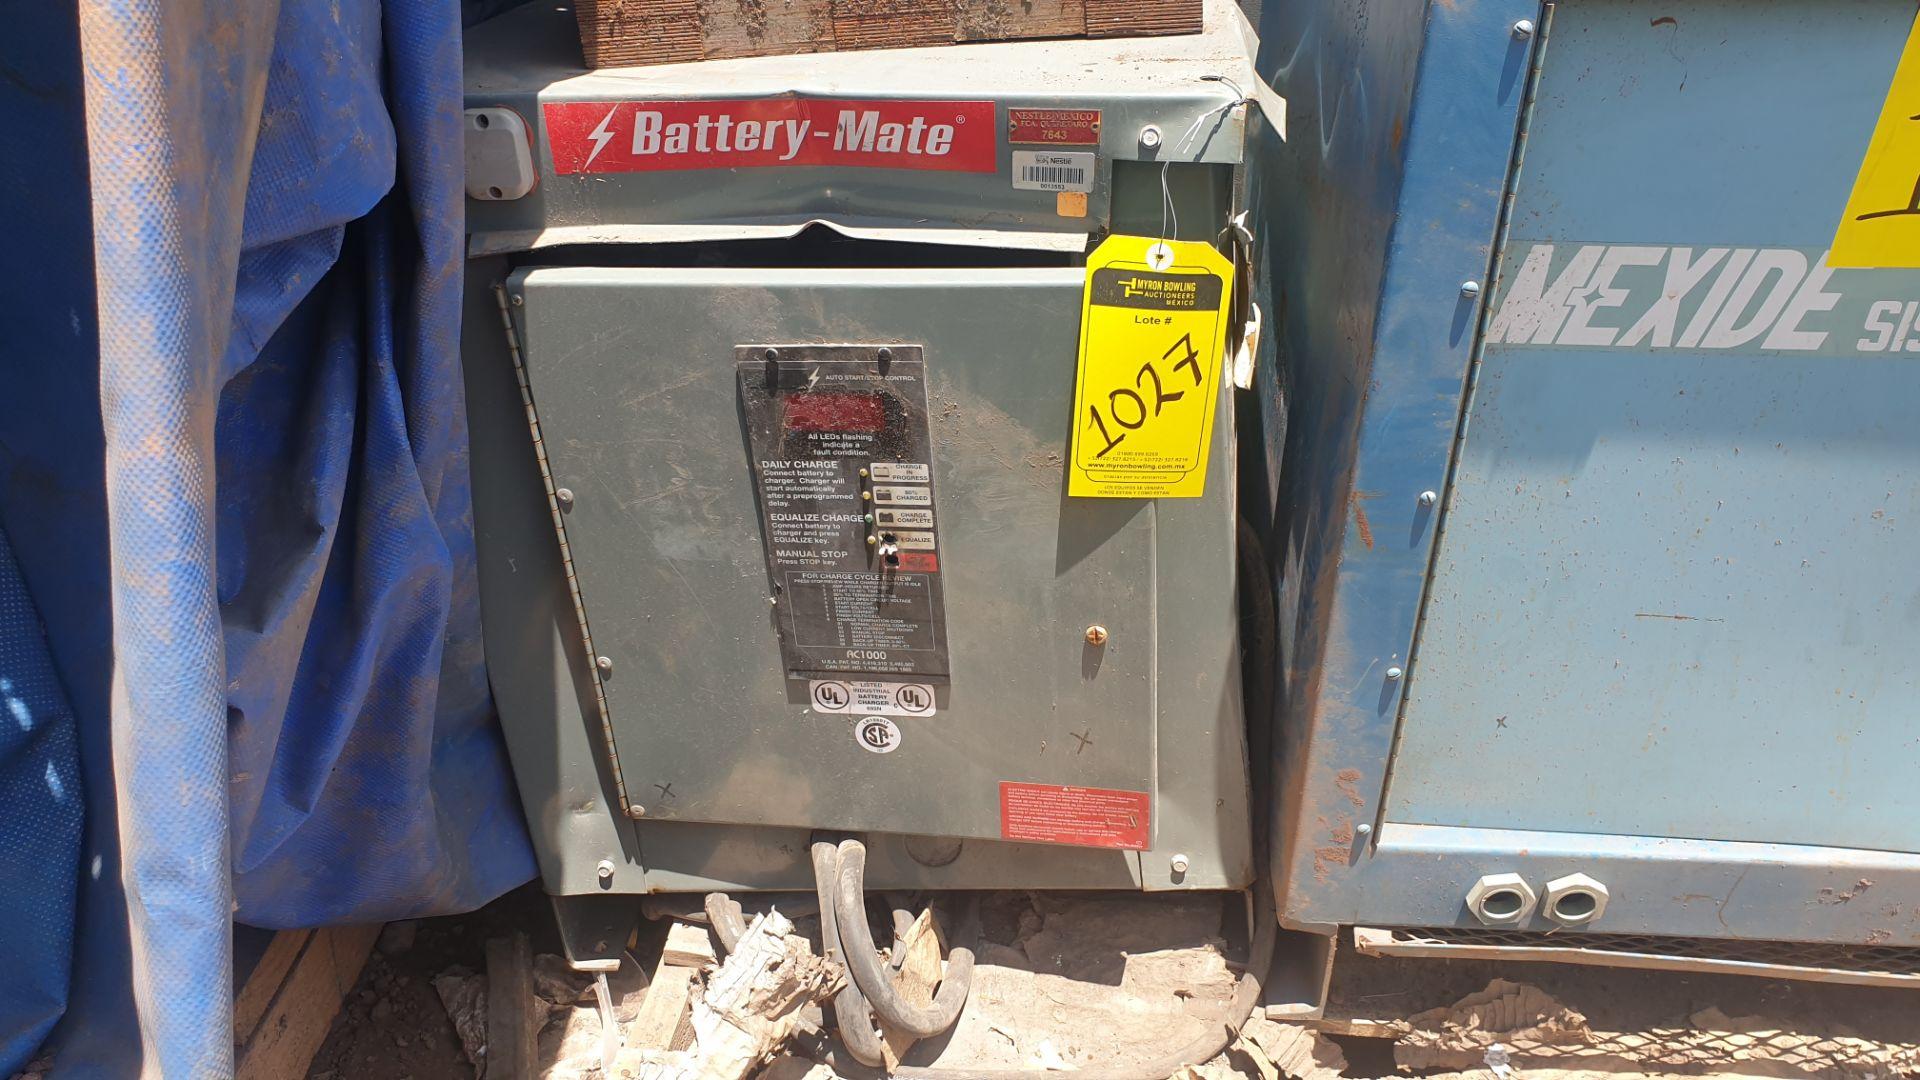 1 Battery-Mate charger, model 1050H3-18C 208/240/480V, 1 Mexide charger model CAS18.3.700 - Image 4 of 9